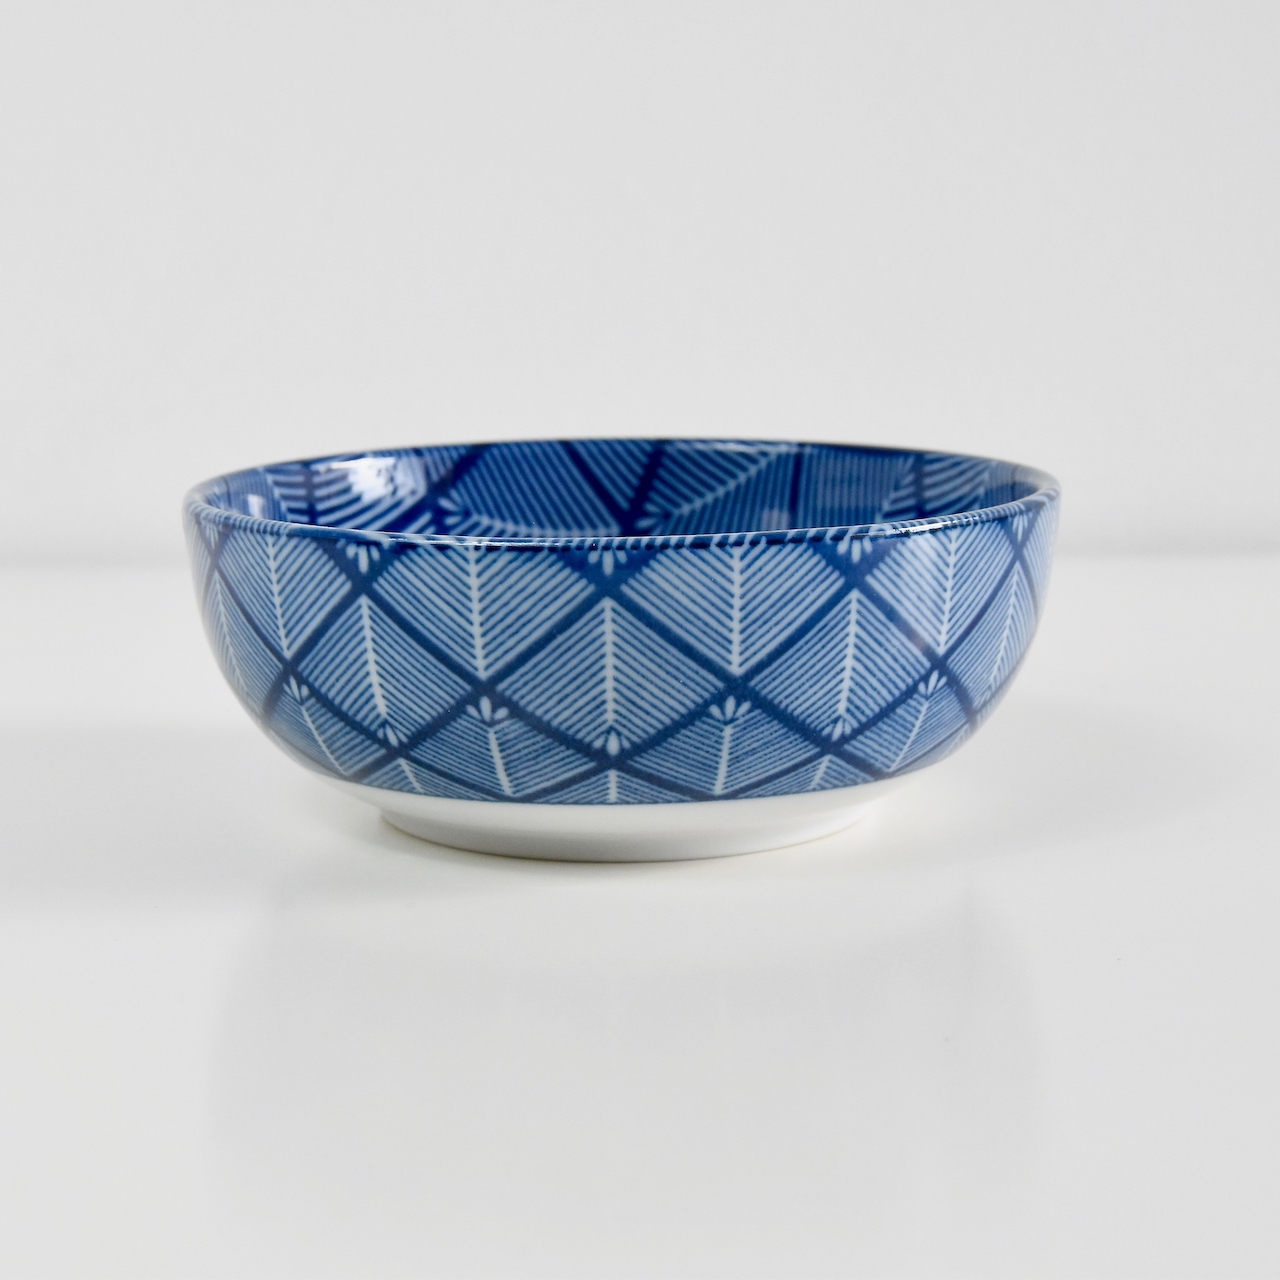 Blue & White Cross Hatch Design Bowl 13 cm